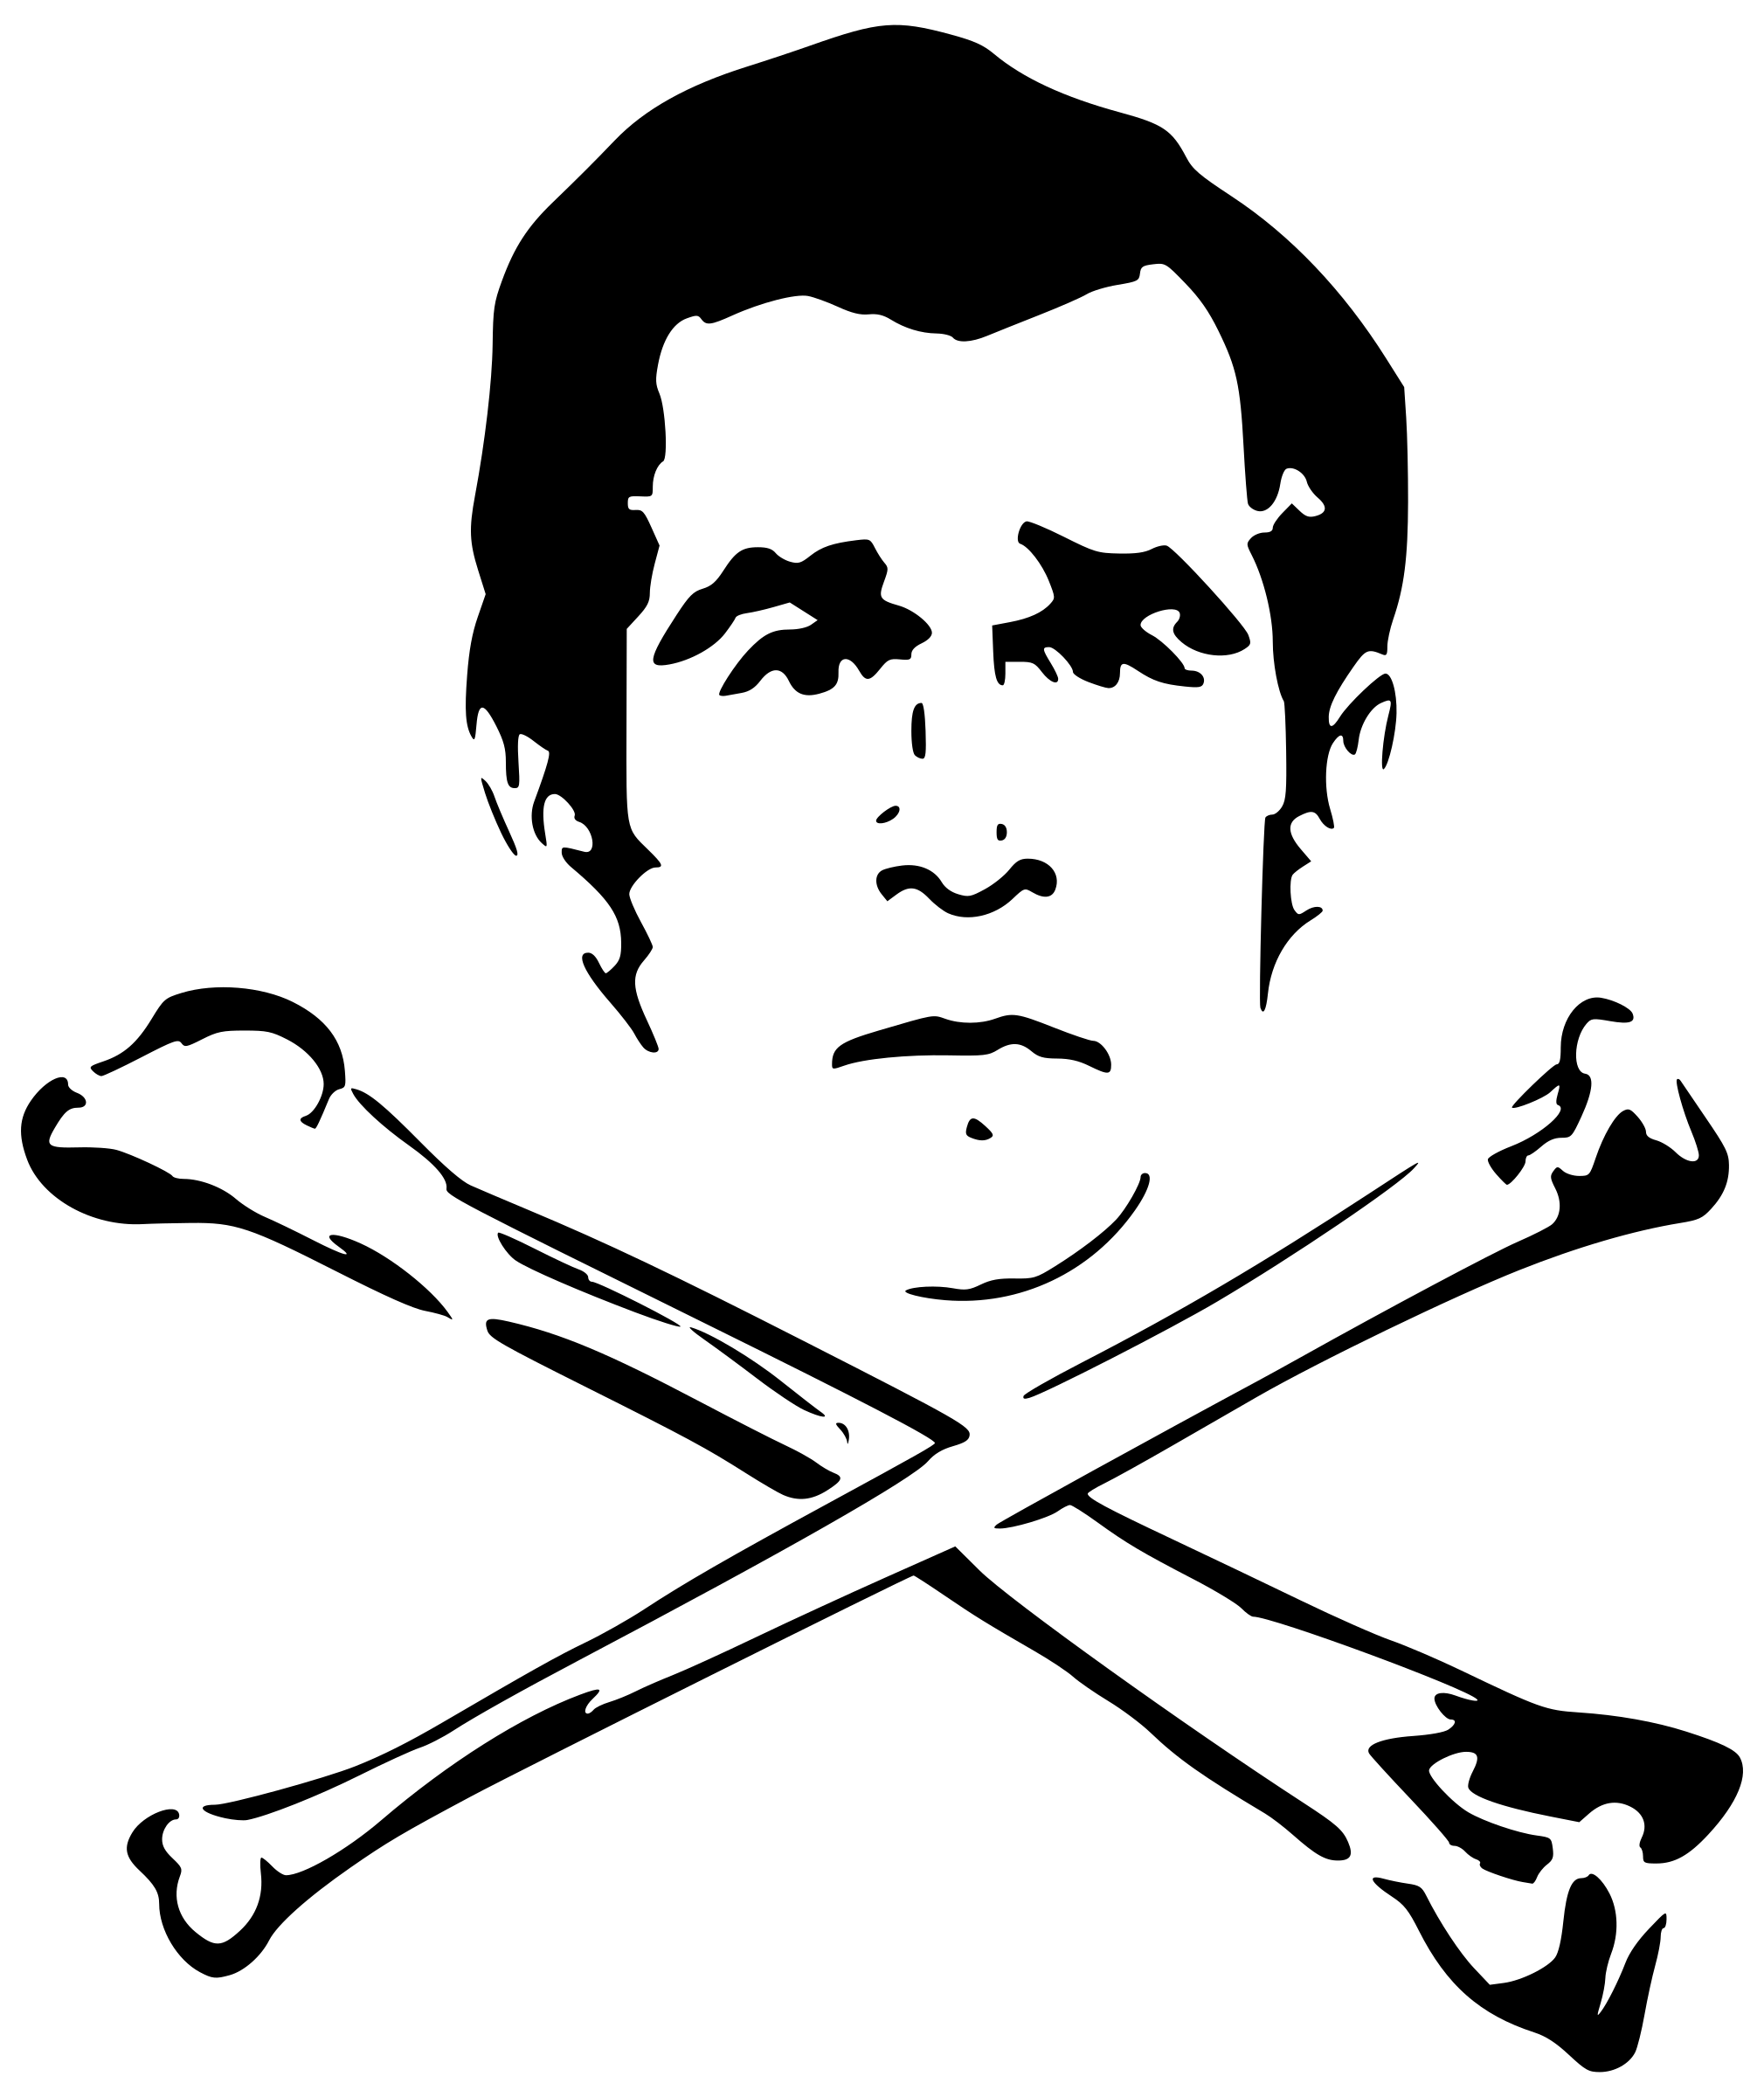 2019x2400 Clipart